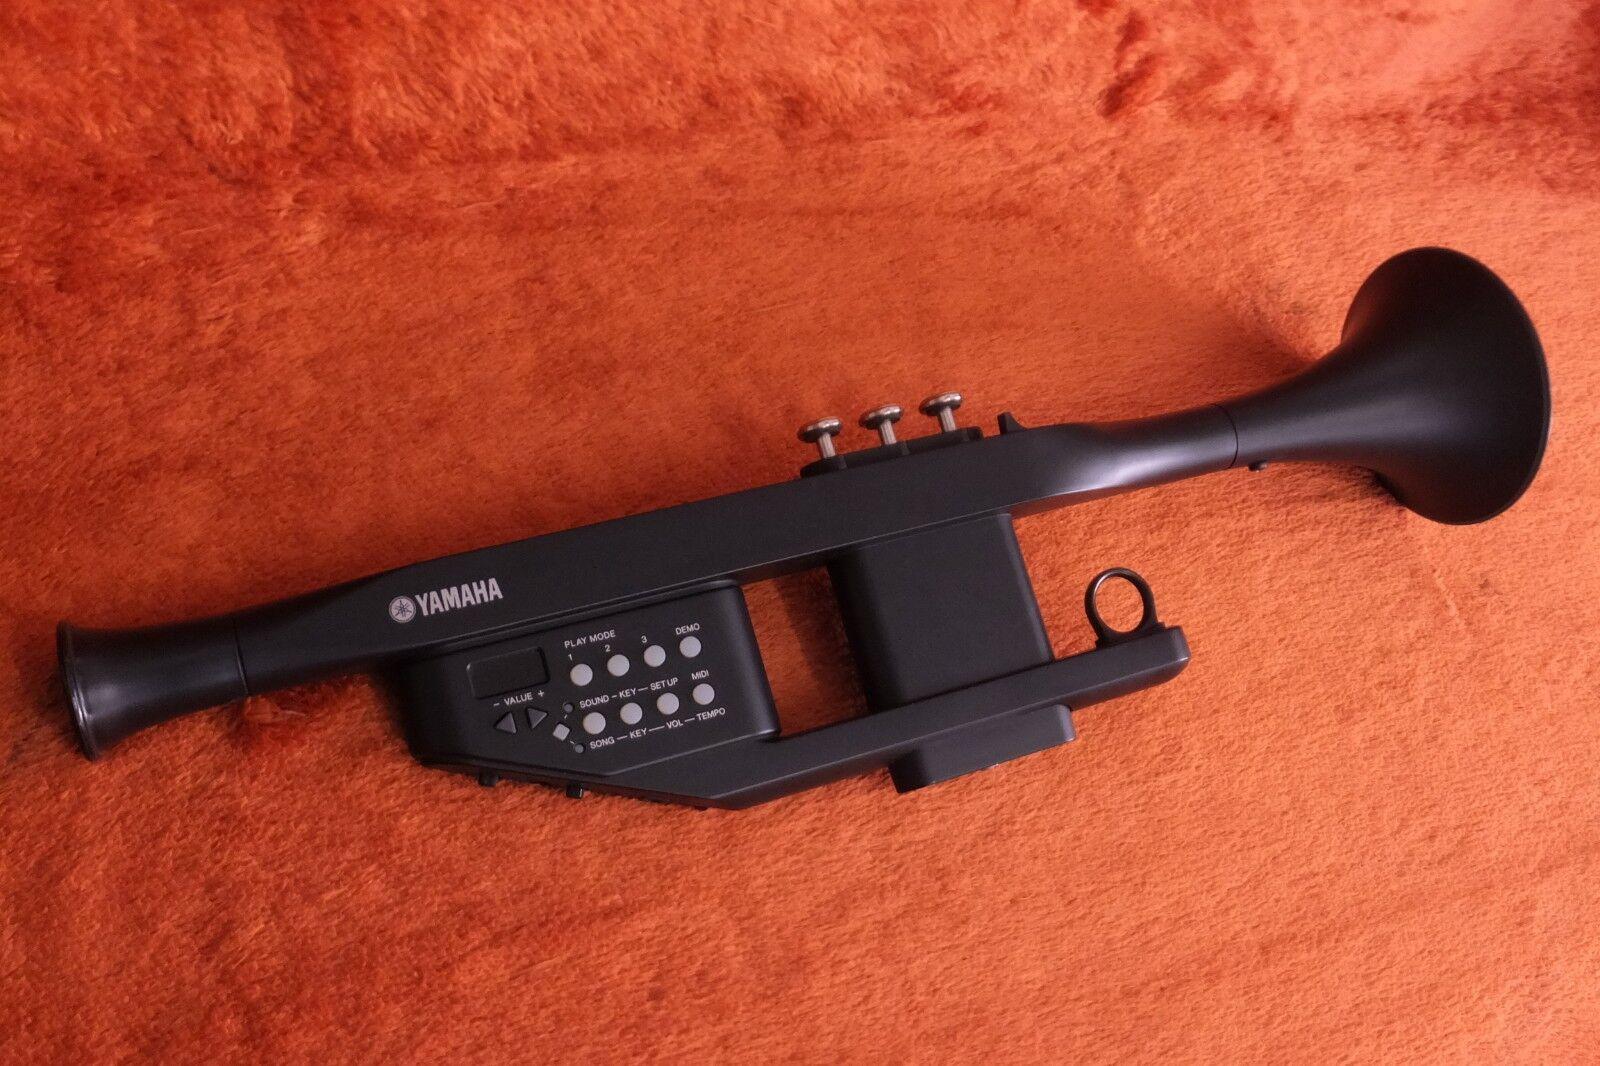 USED Yamaha EZ-TP Digital Silent Trumpet Worldwide Shipment JZLM01601 180502